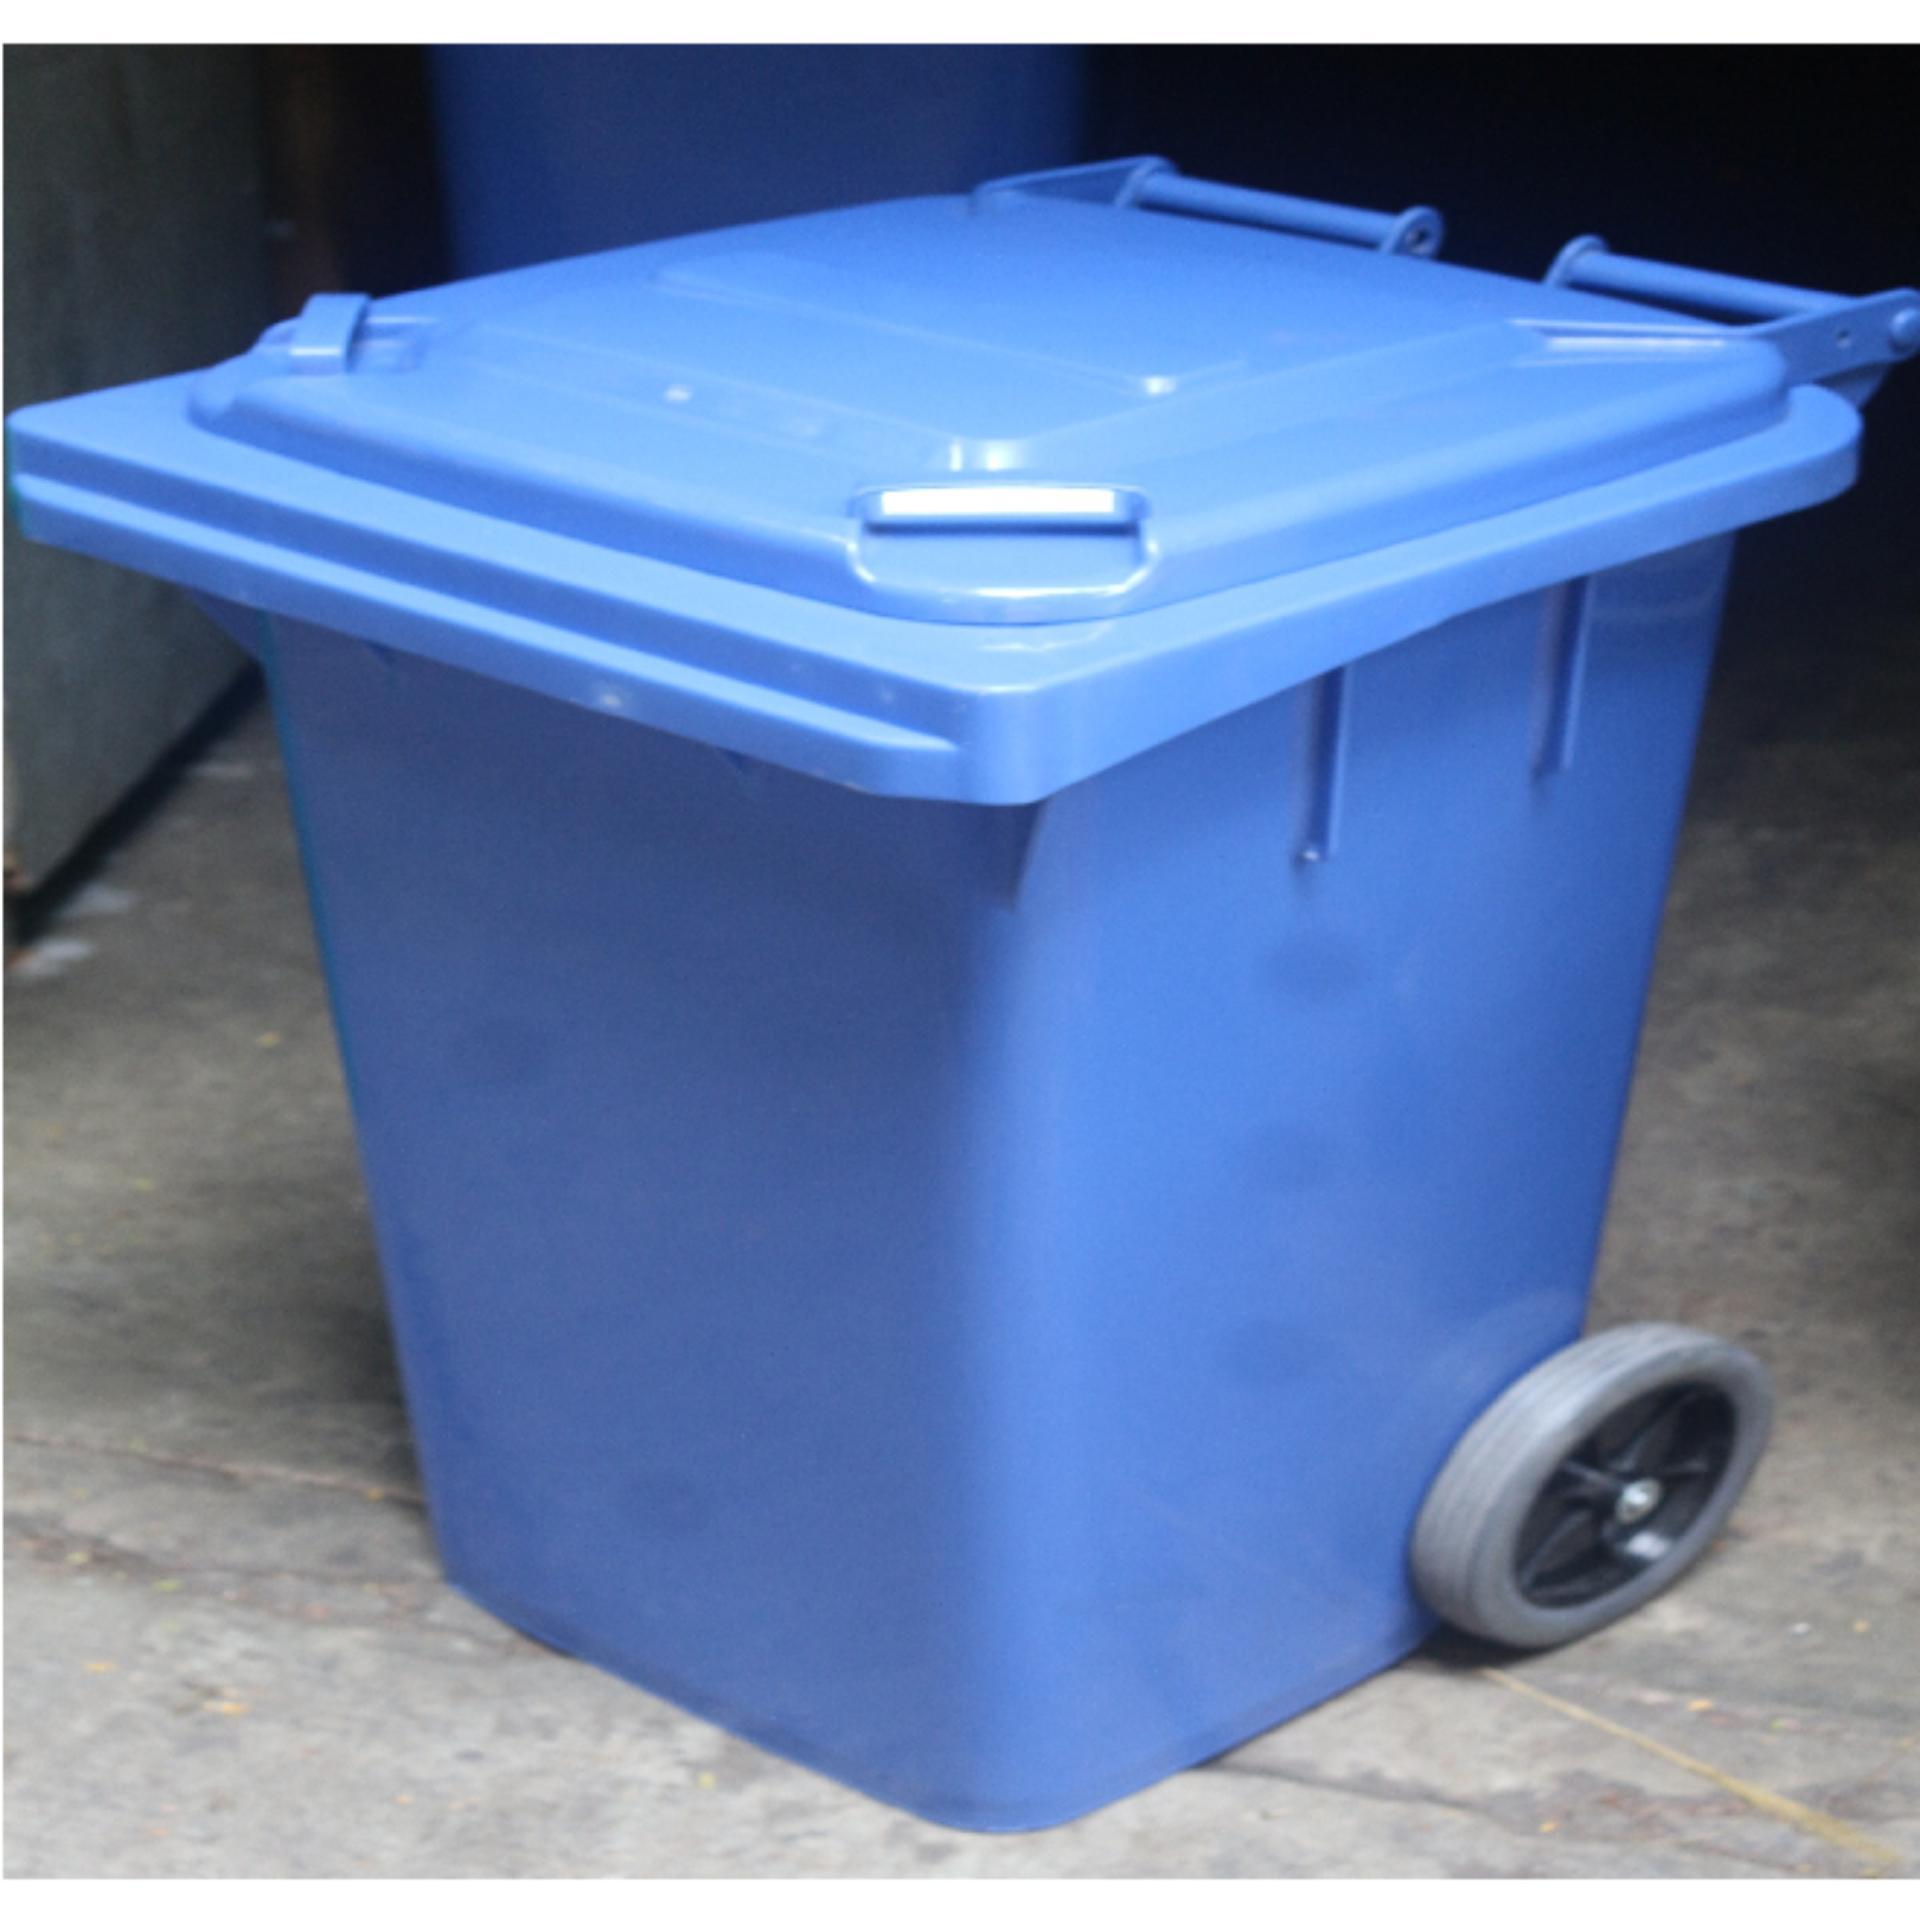 Greencare Hooded Waste Segregation Trash Bin Philippines